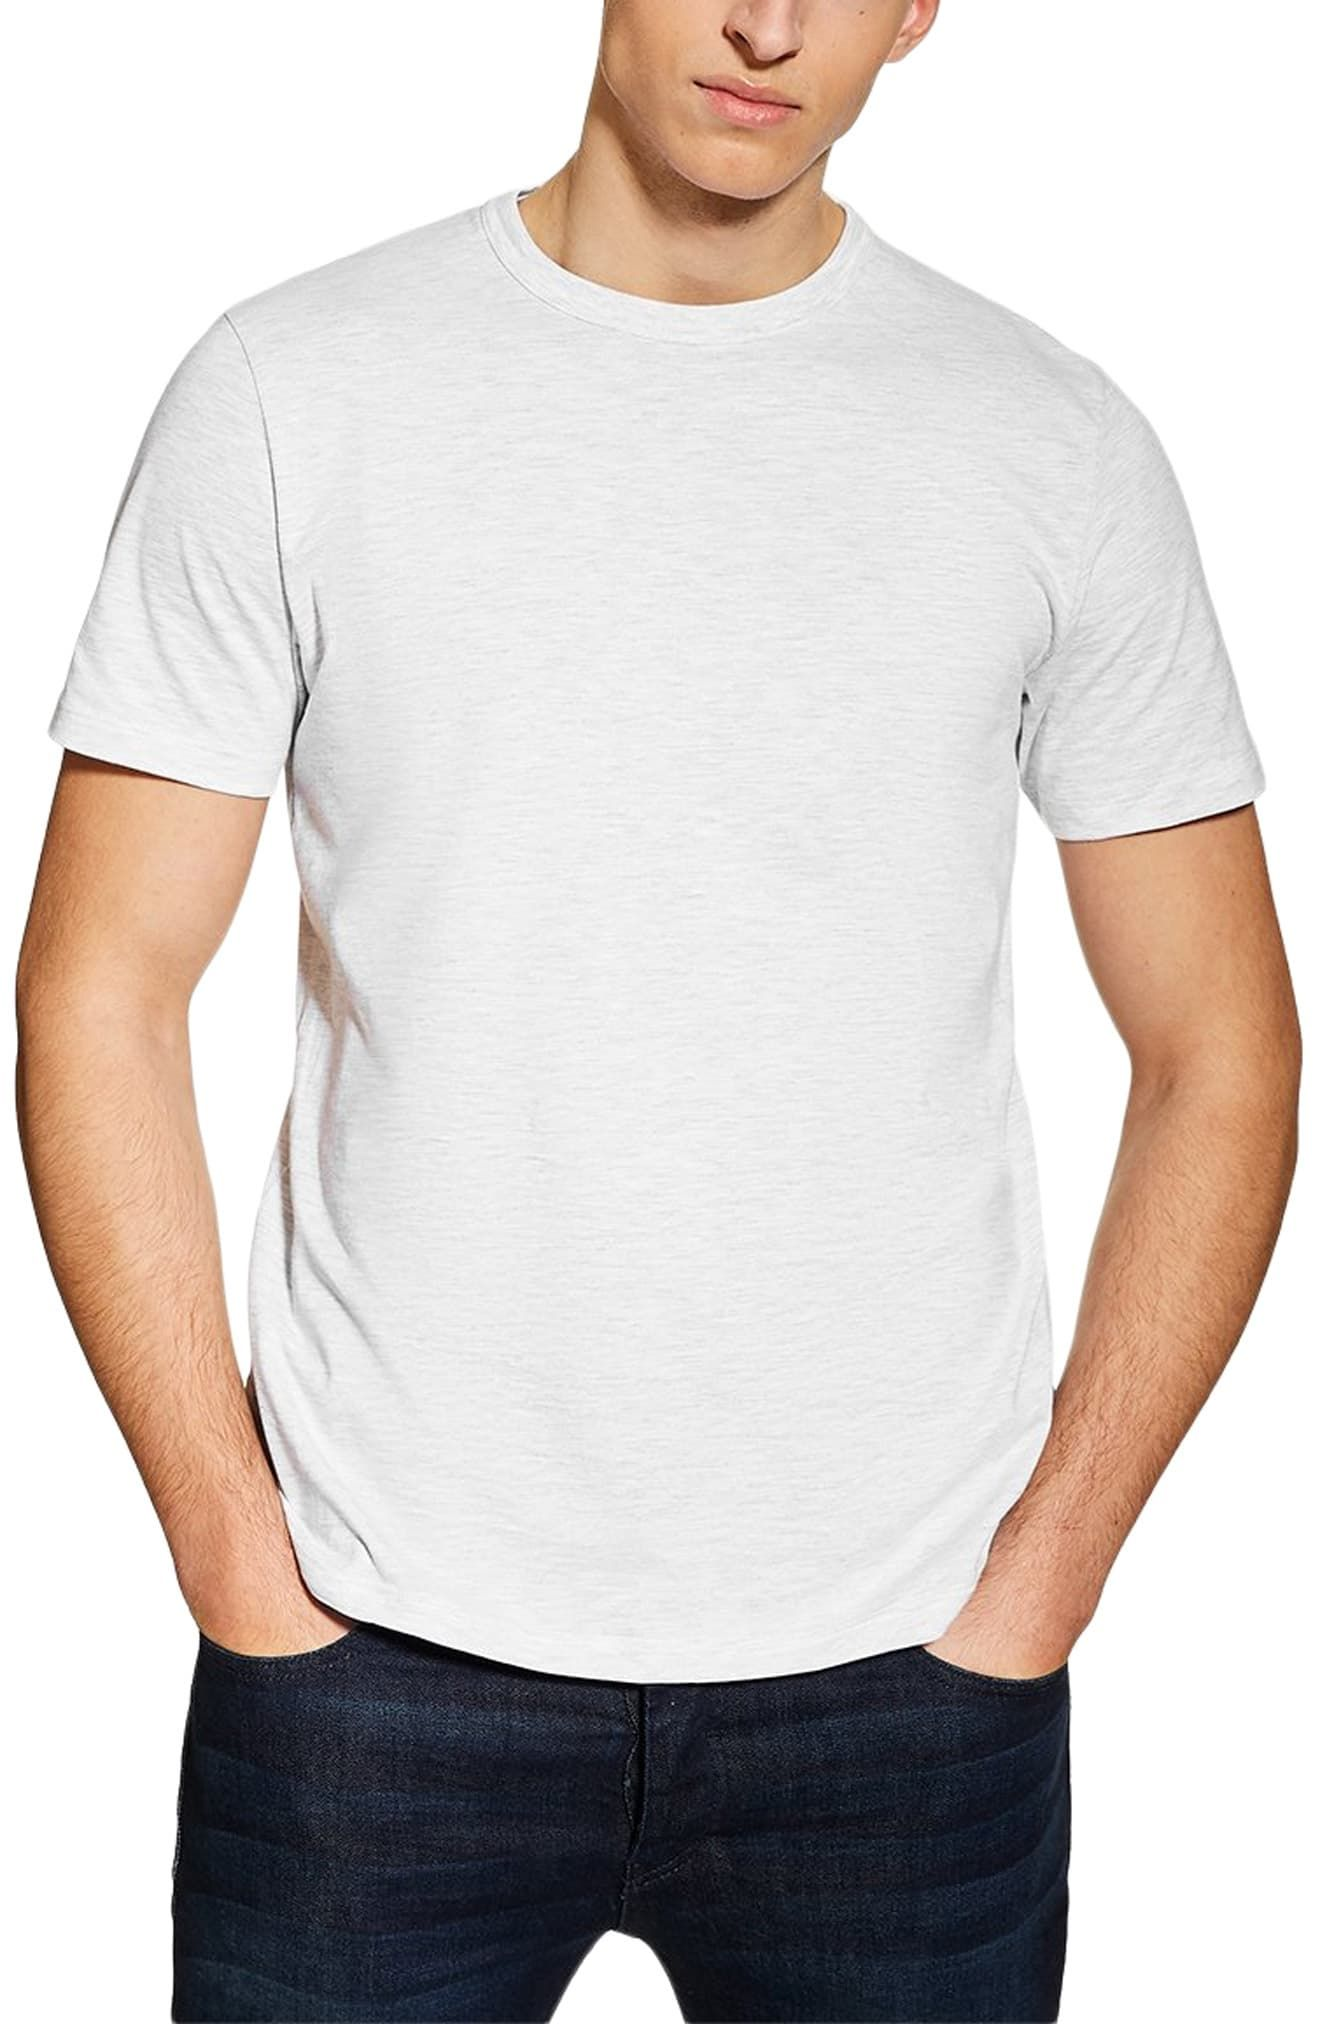 29f0c02b15bdd Men's Topman 3-Pack Classic Fit Crewneck T-Shirts, Size X-Large - Grey